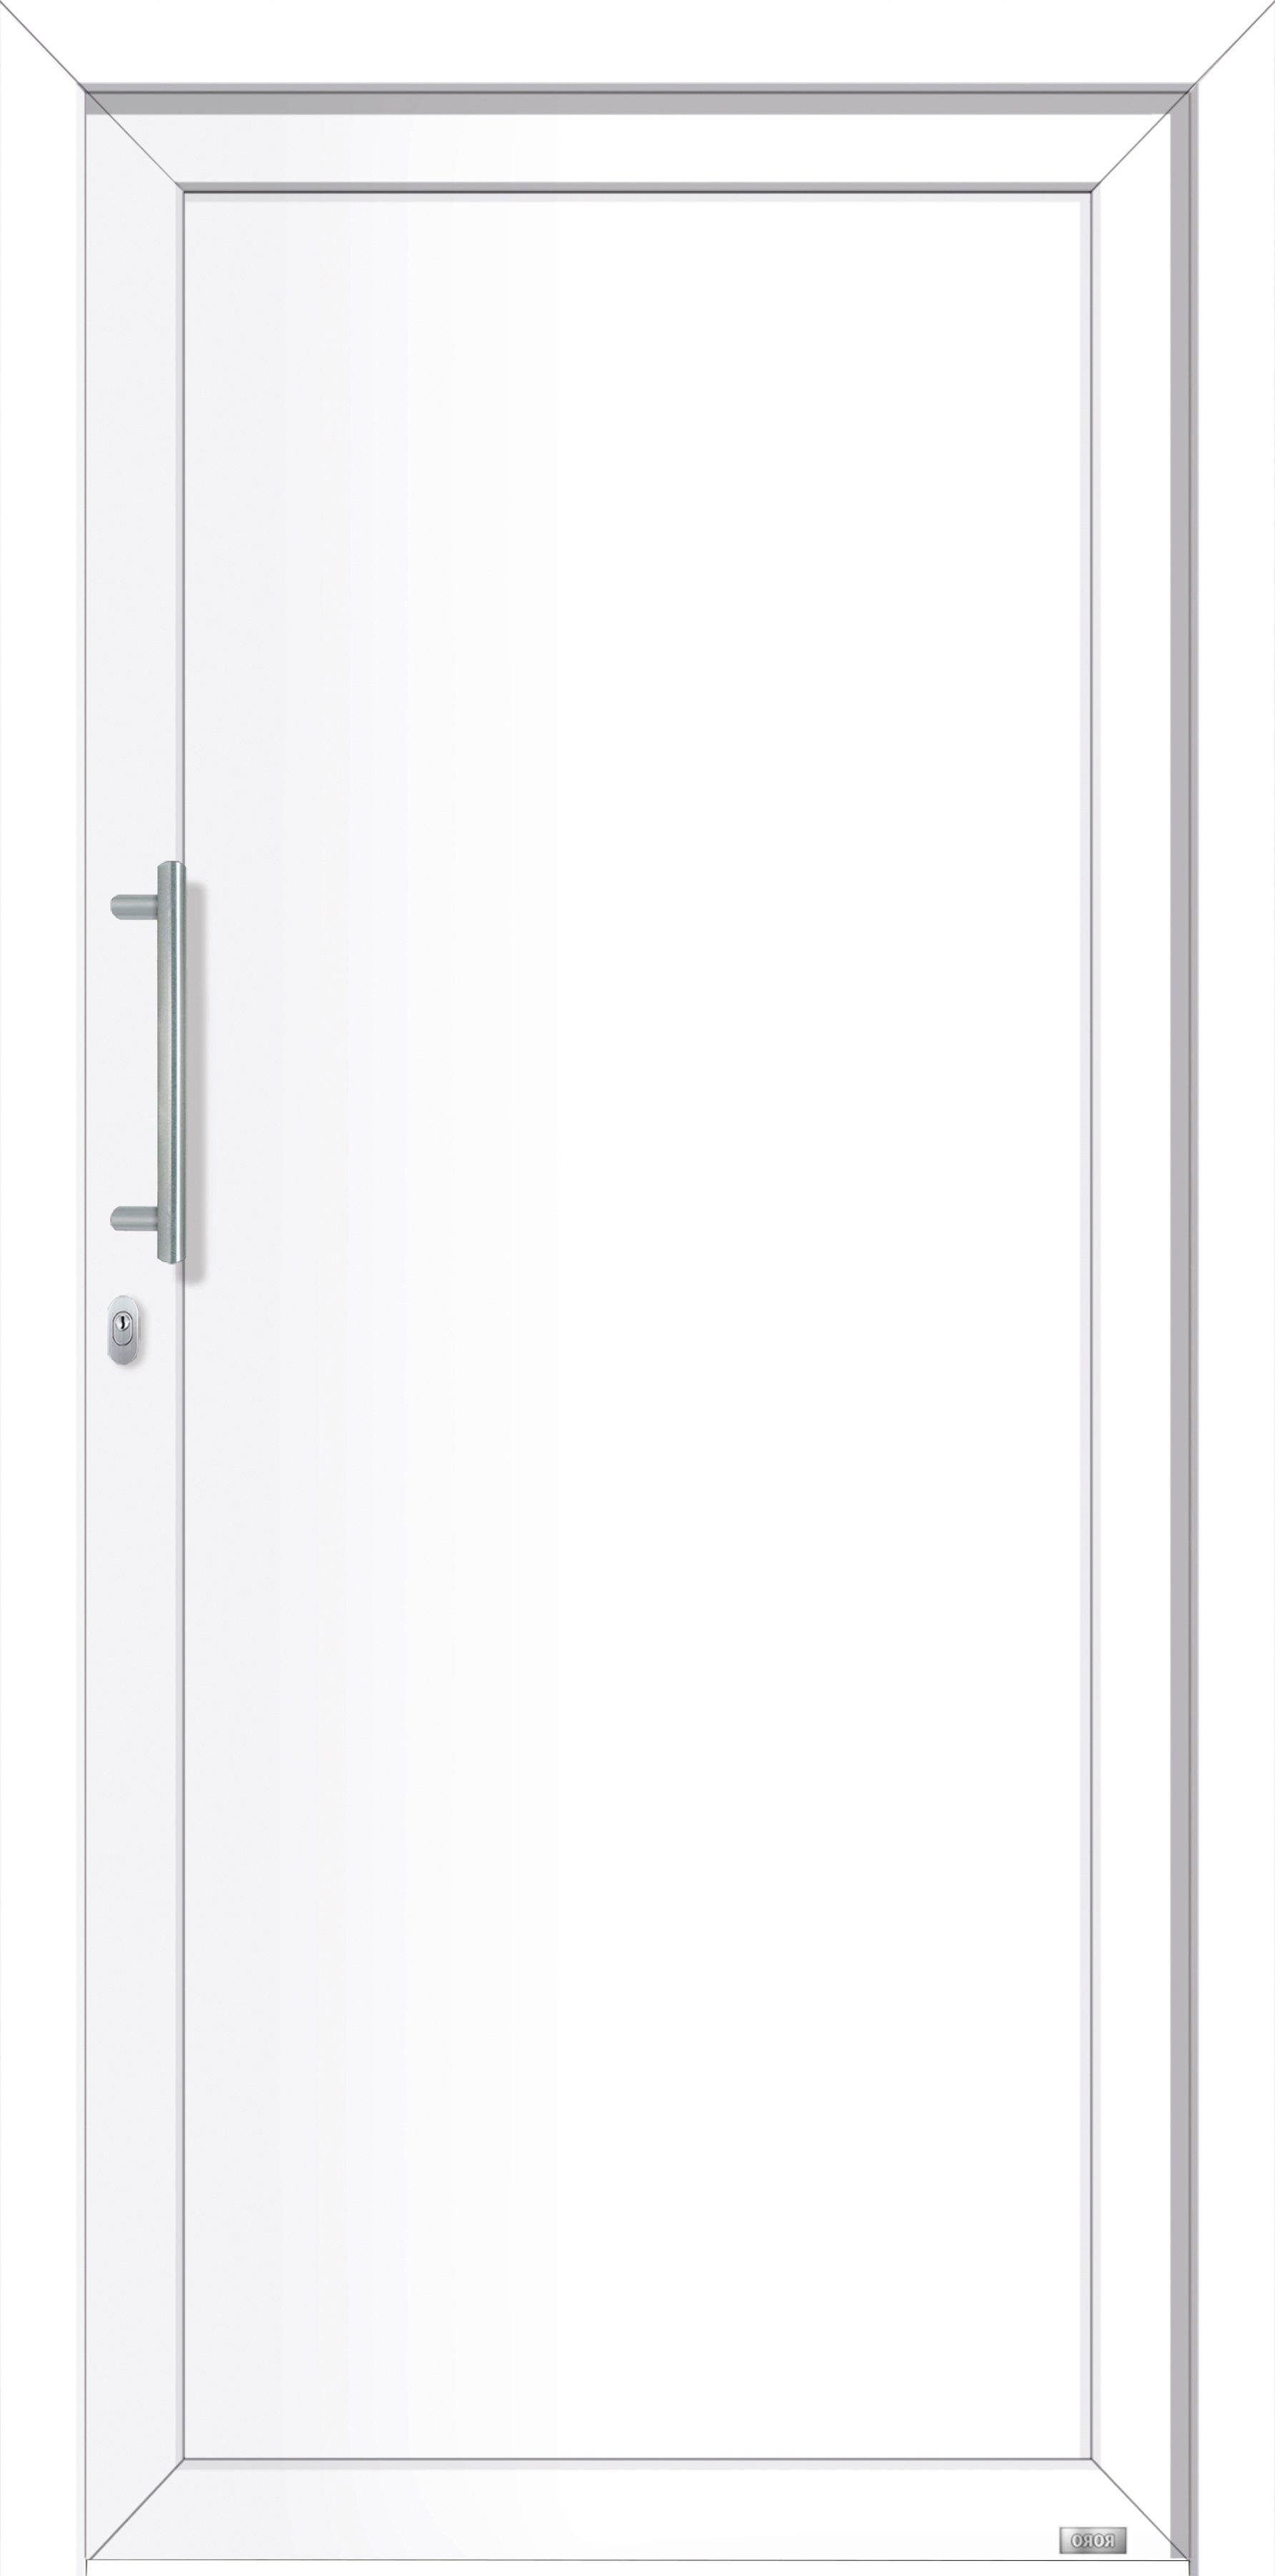 RORO Aluminium-Haustür »Irland«, BxH: 98x198 cm, weiß, Anschlag links